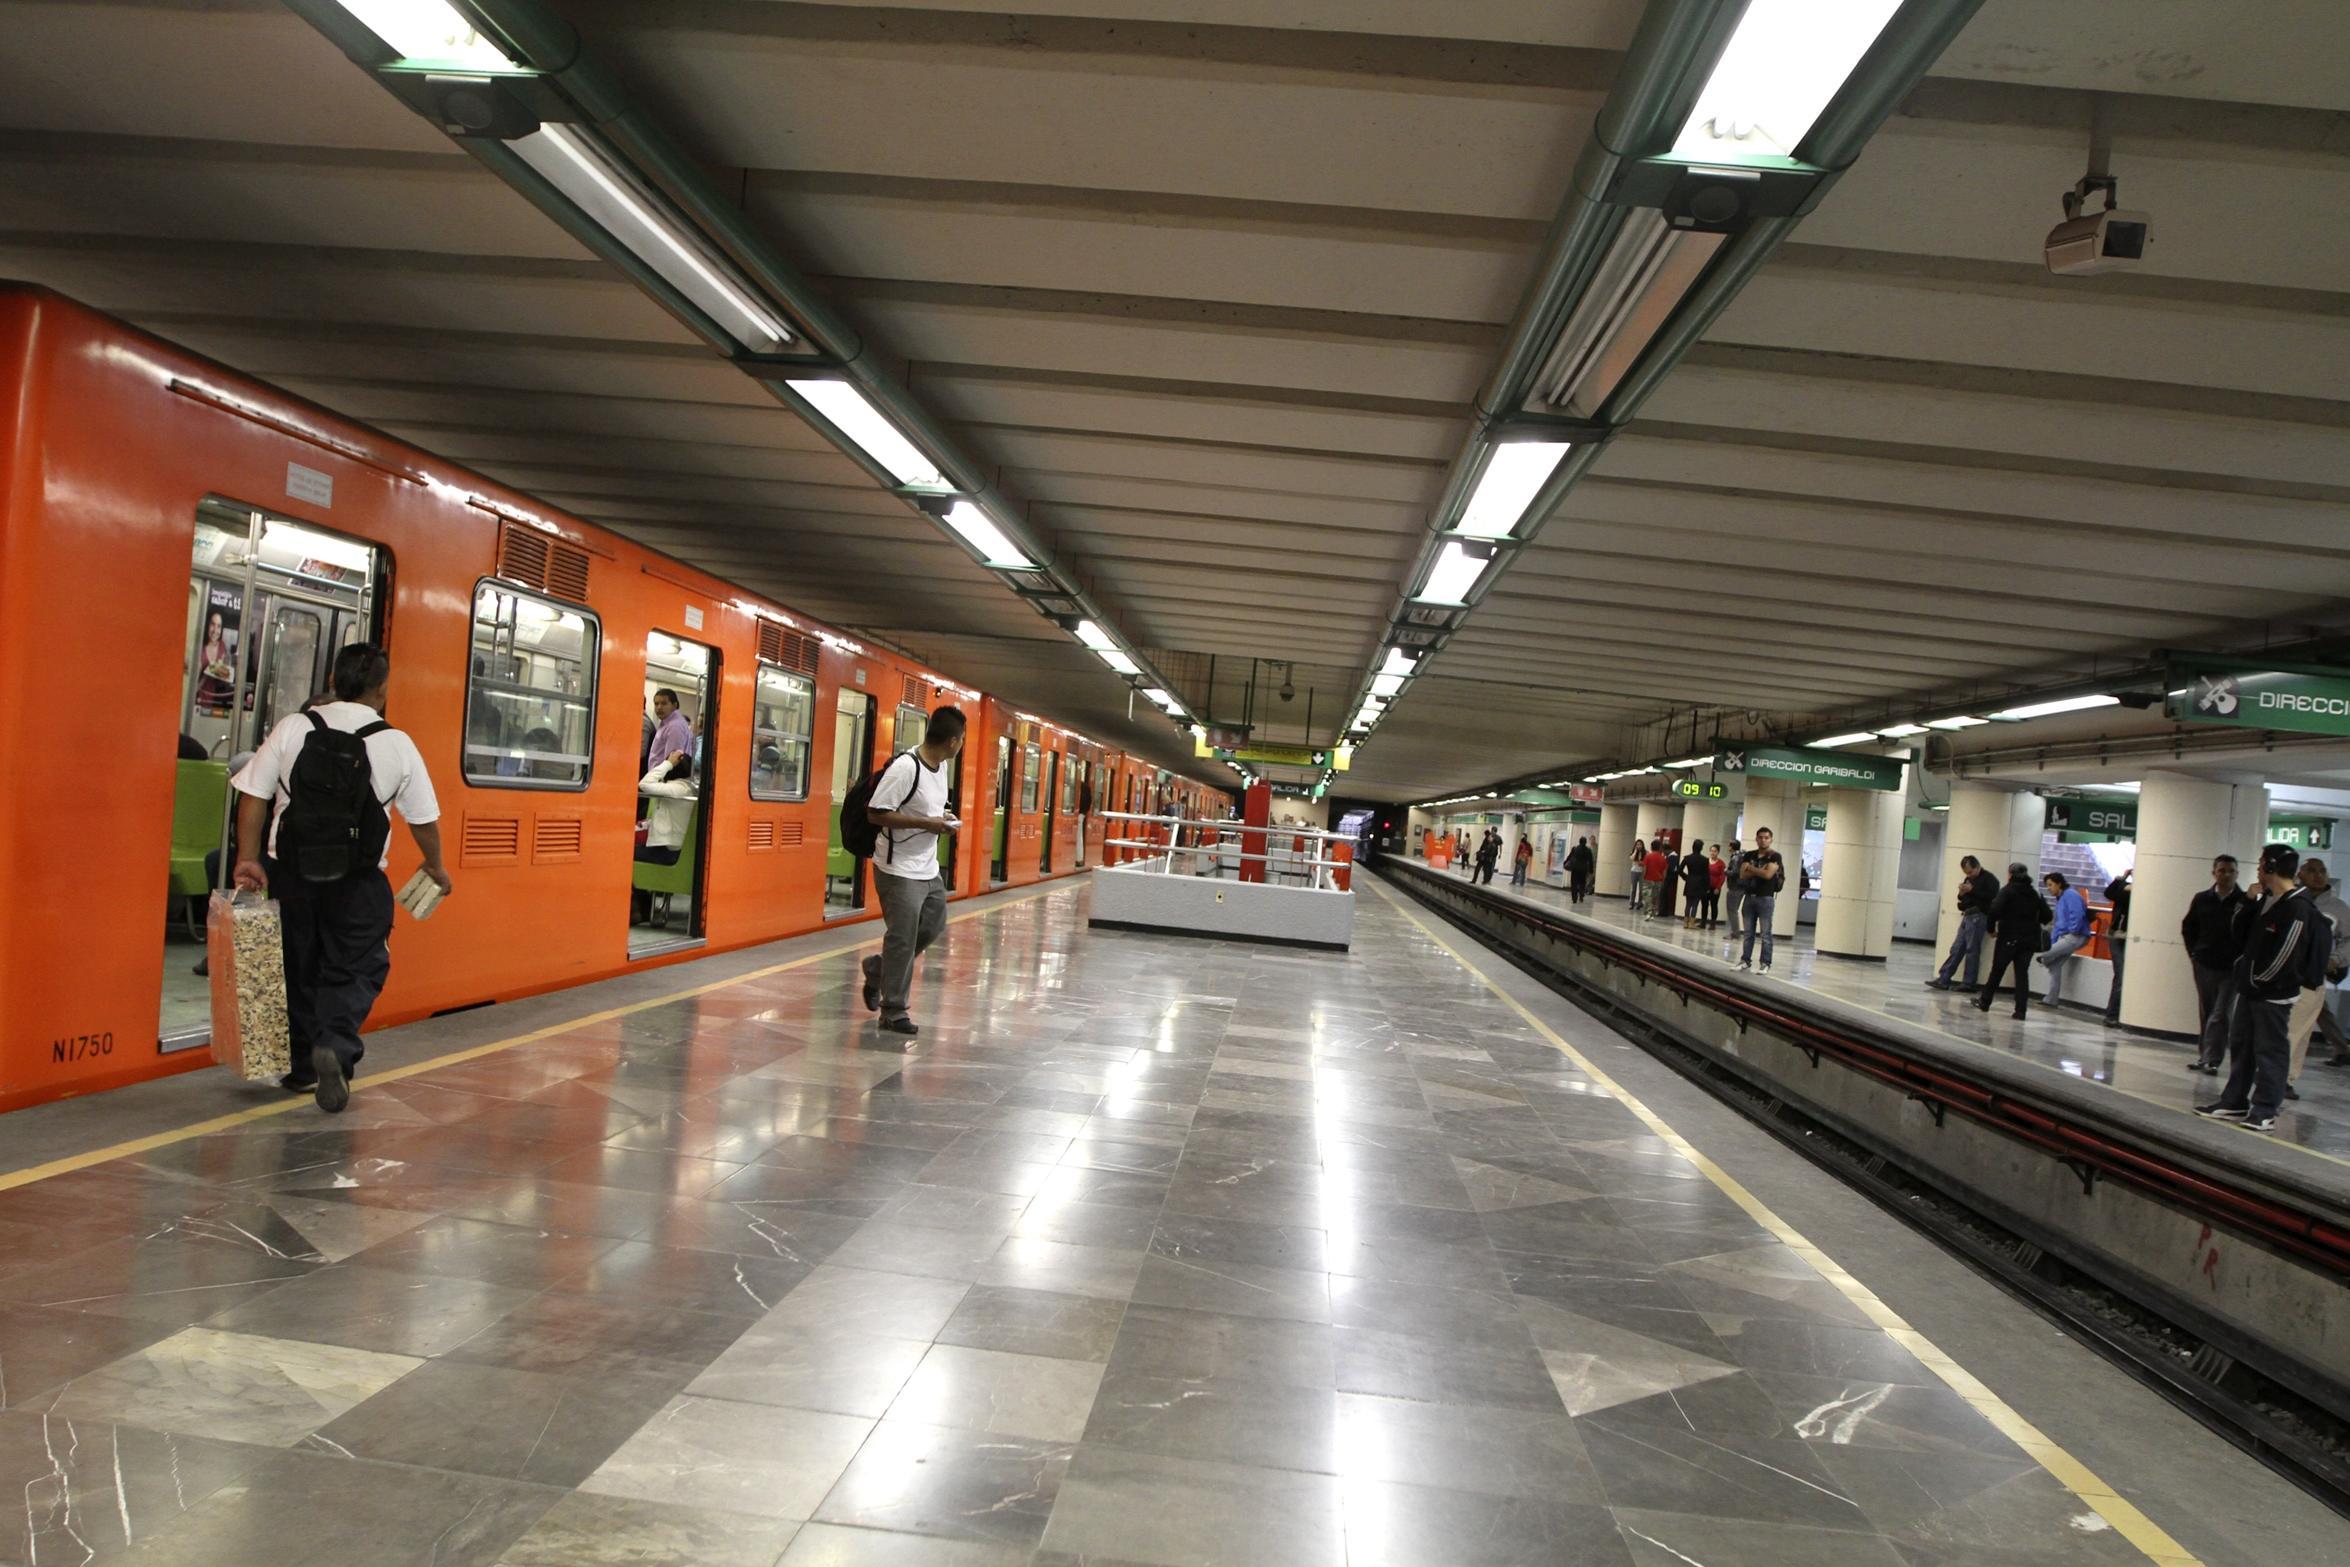 Horario de Metro para Día de Muertos